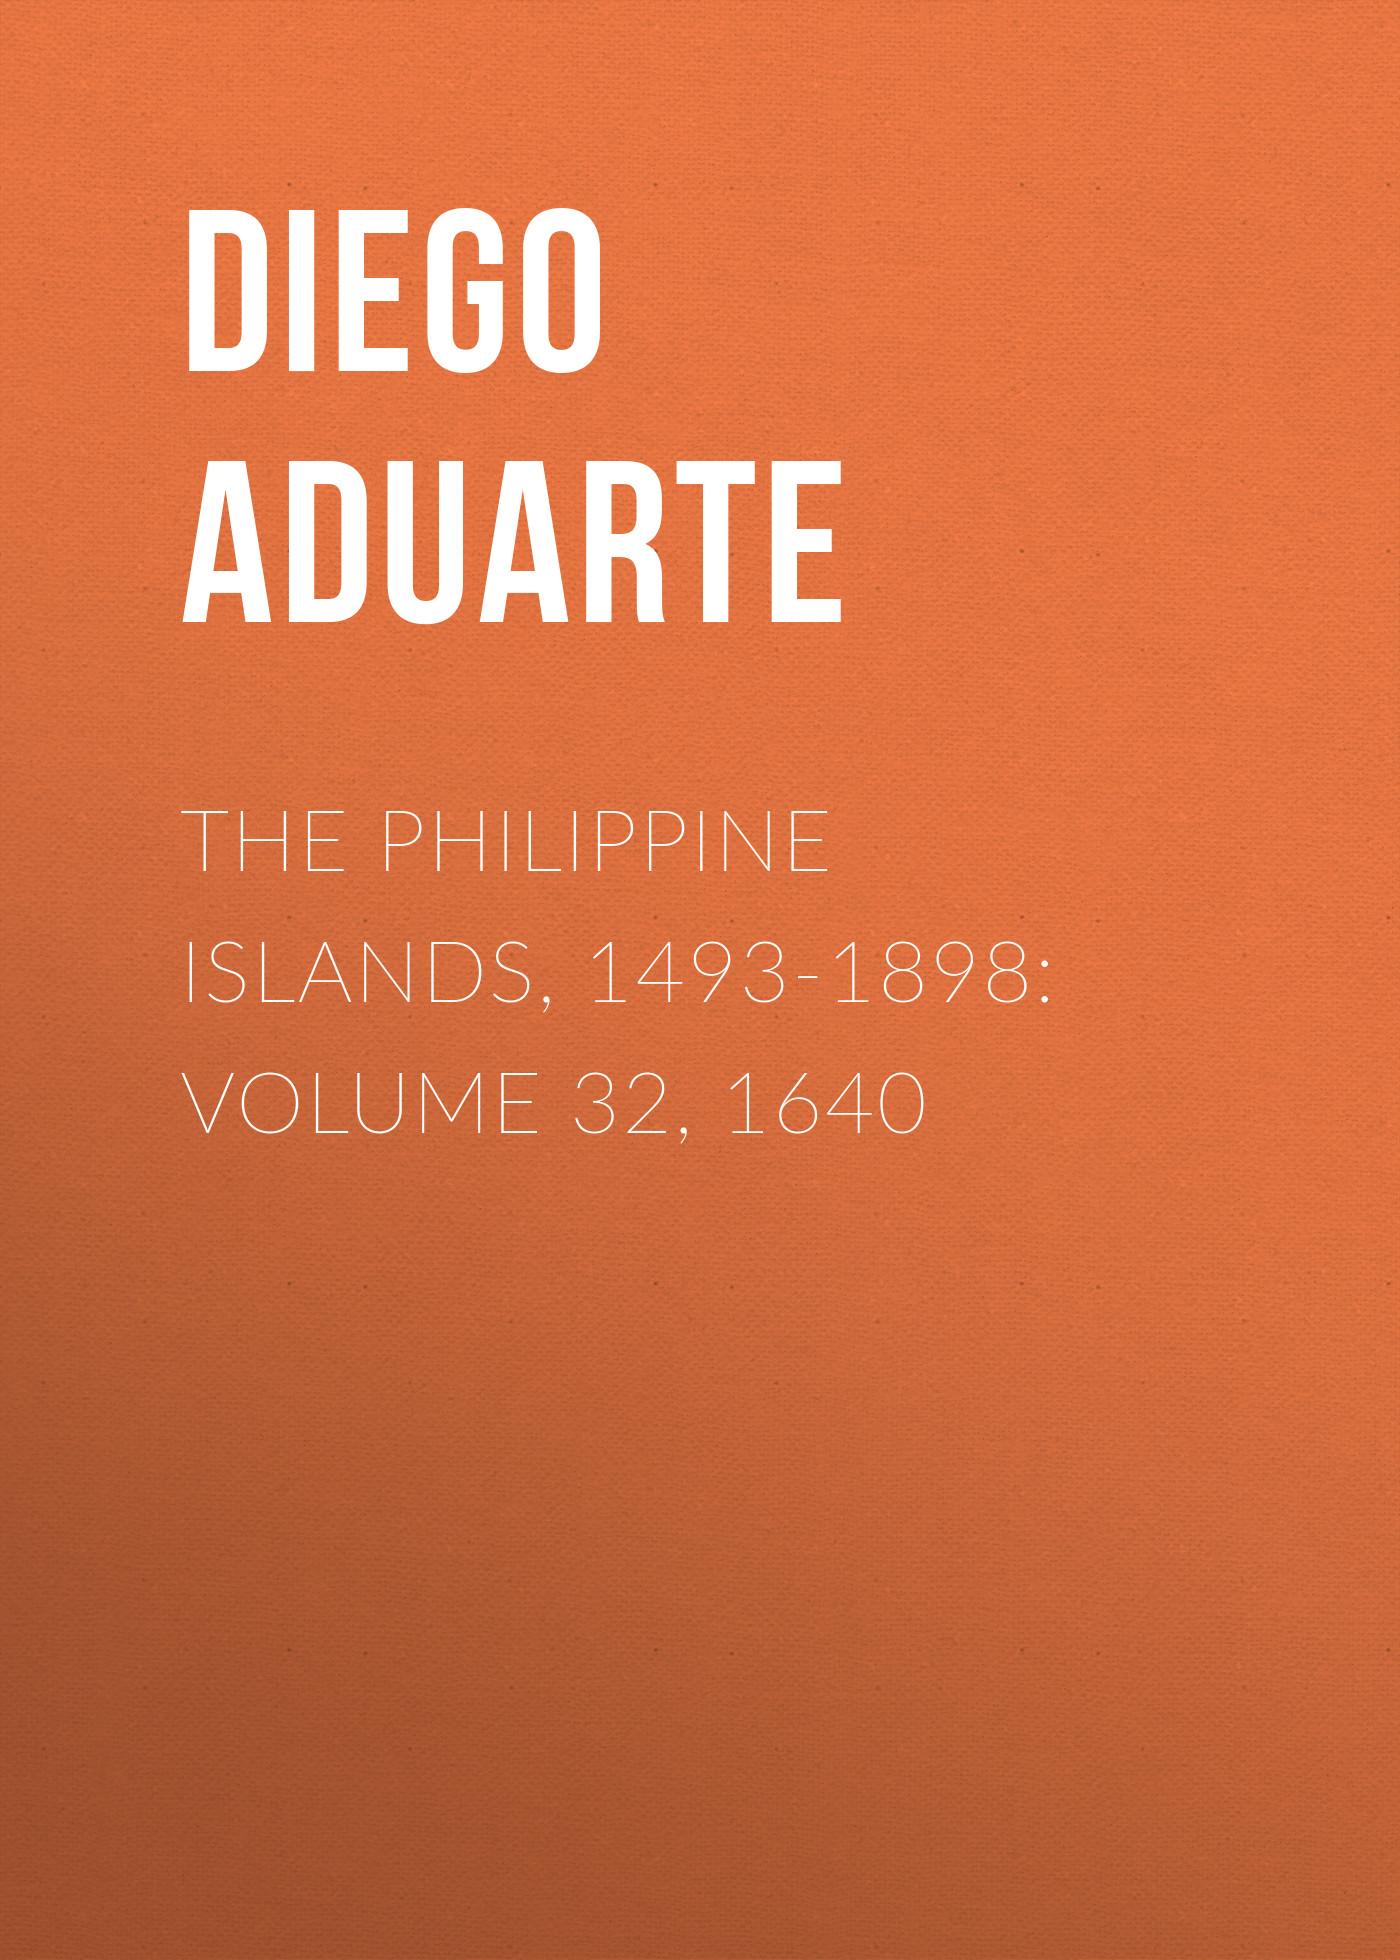 Aduarte Diego The Philippine Islands, 1493-1898: Volume 32, 1640 diego dolcini туфли